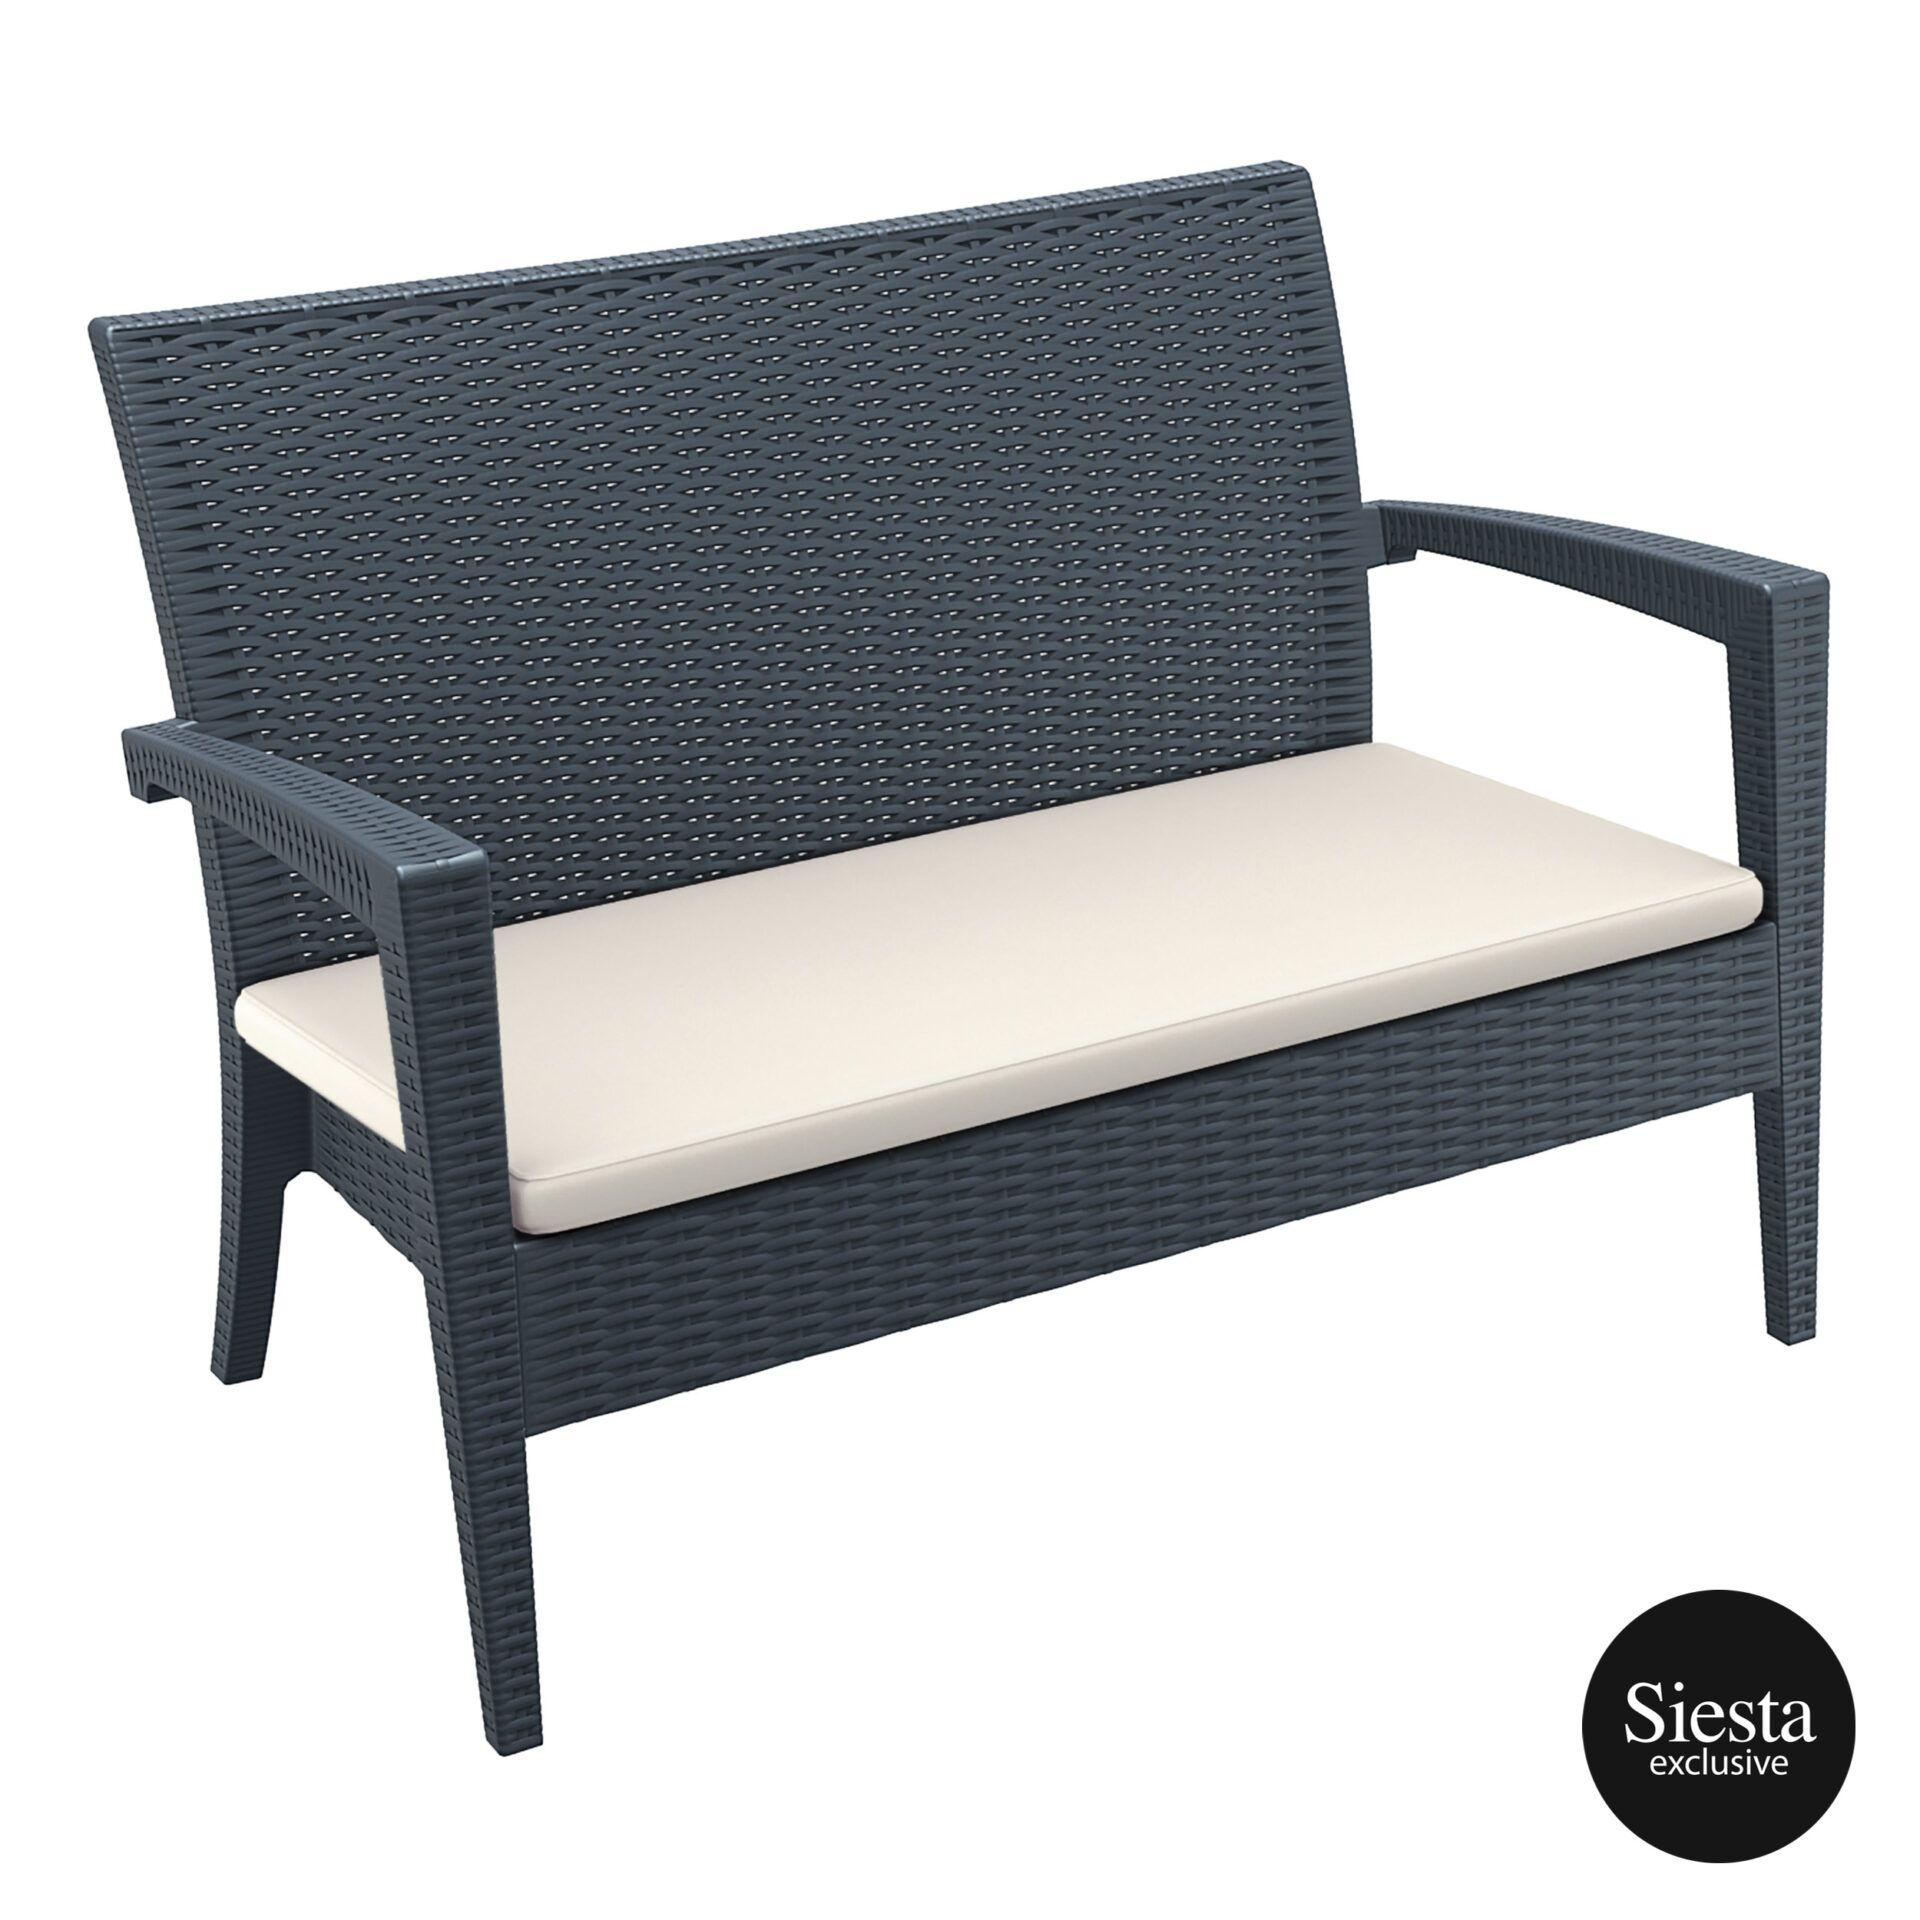 Resin Rattan Miami Tequila Lounge sofa cushion darkgrey front side